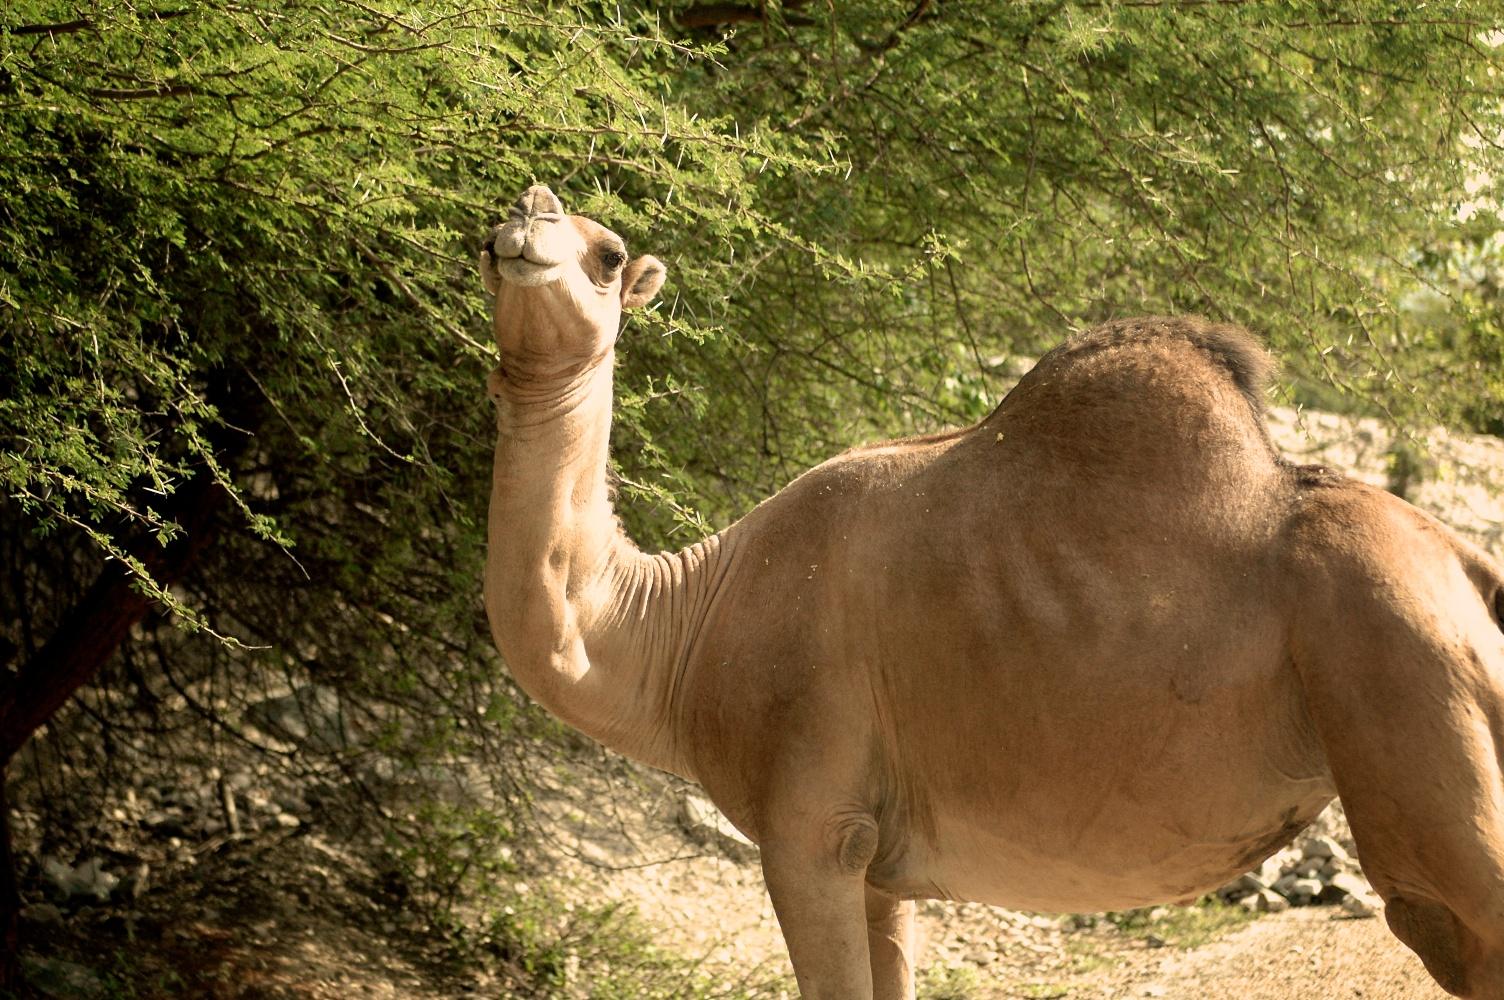 Camel @ the lake